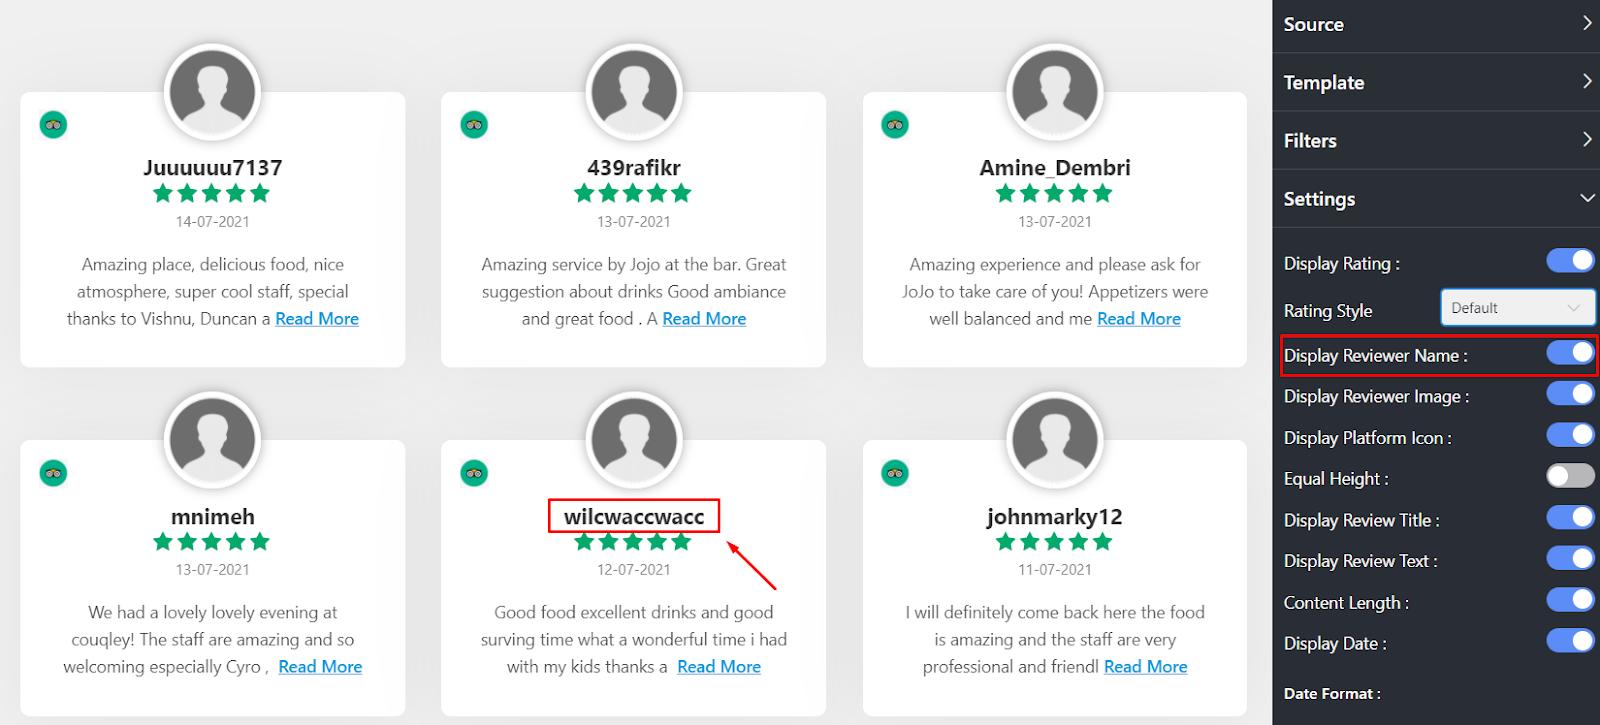 Display reviewer name